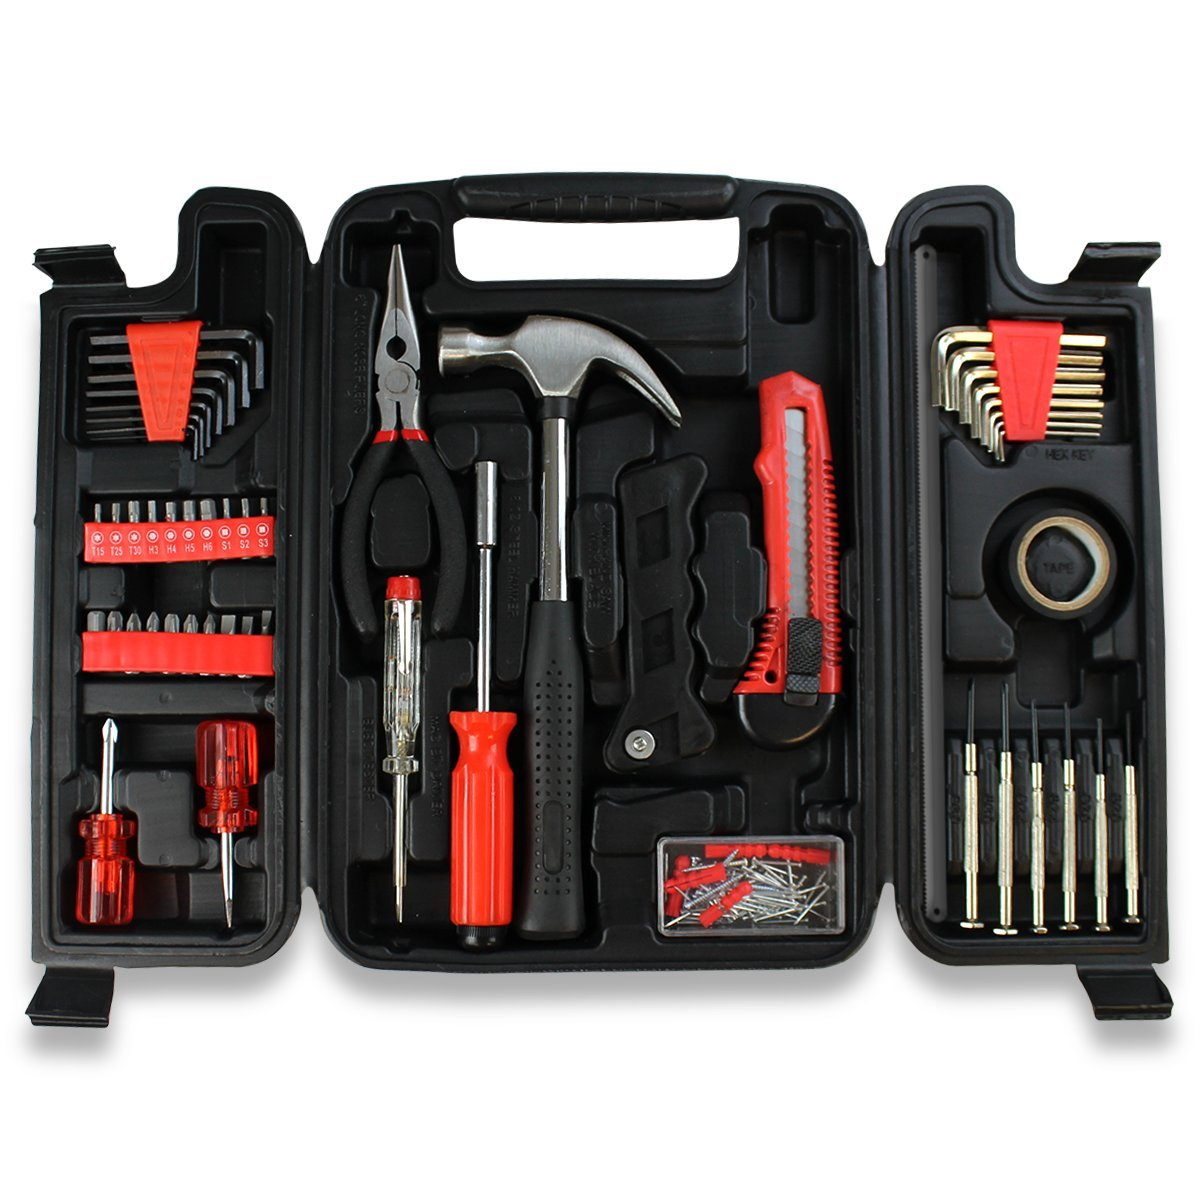 Home Repair Tool Kit by Tycana   Multi Tool Set, Homeowner Tool Kit, Tool Set   For All Home Repairs   142 Piece Kit